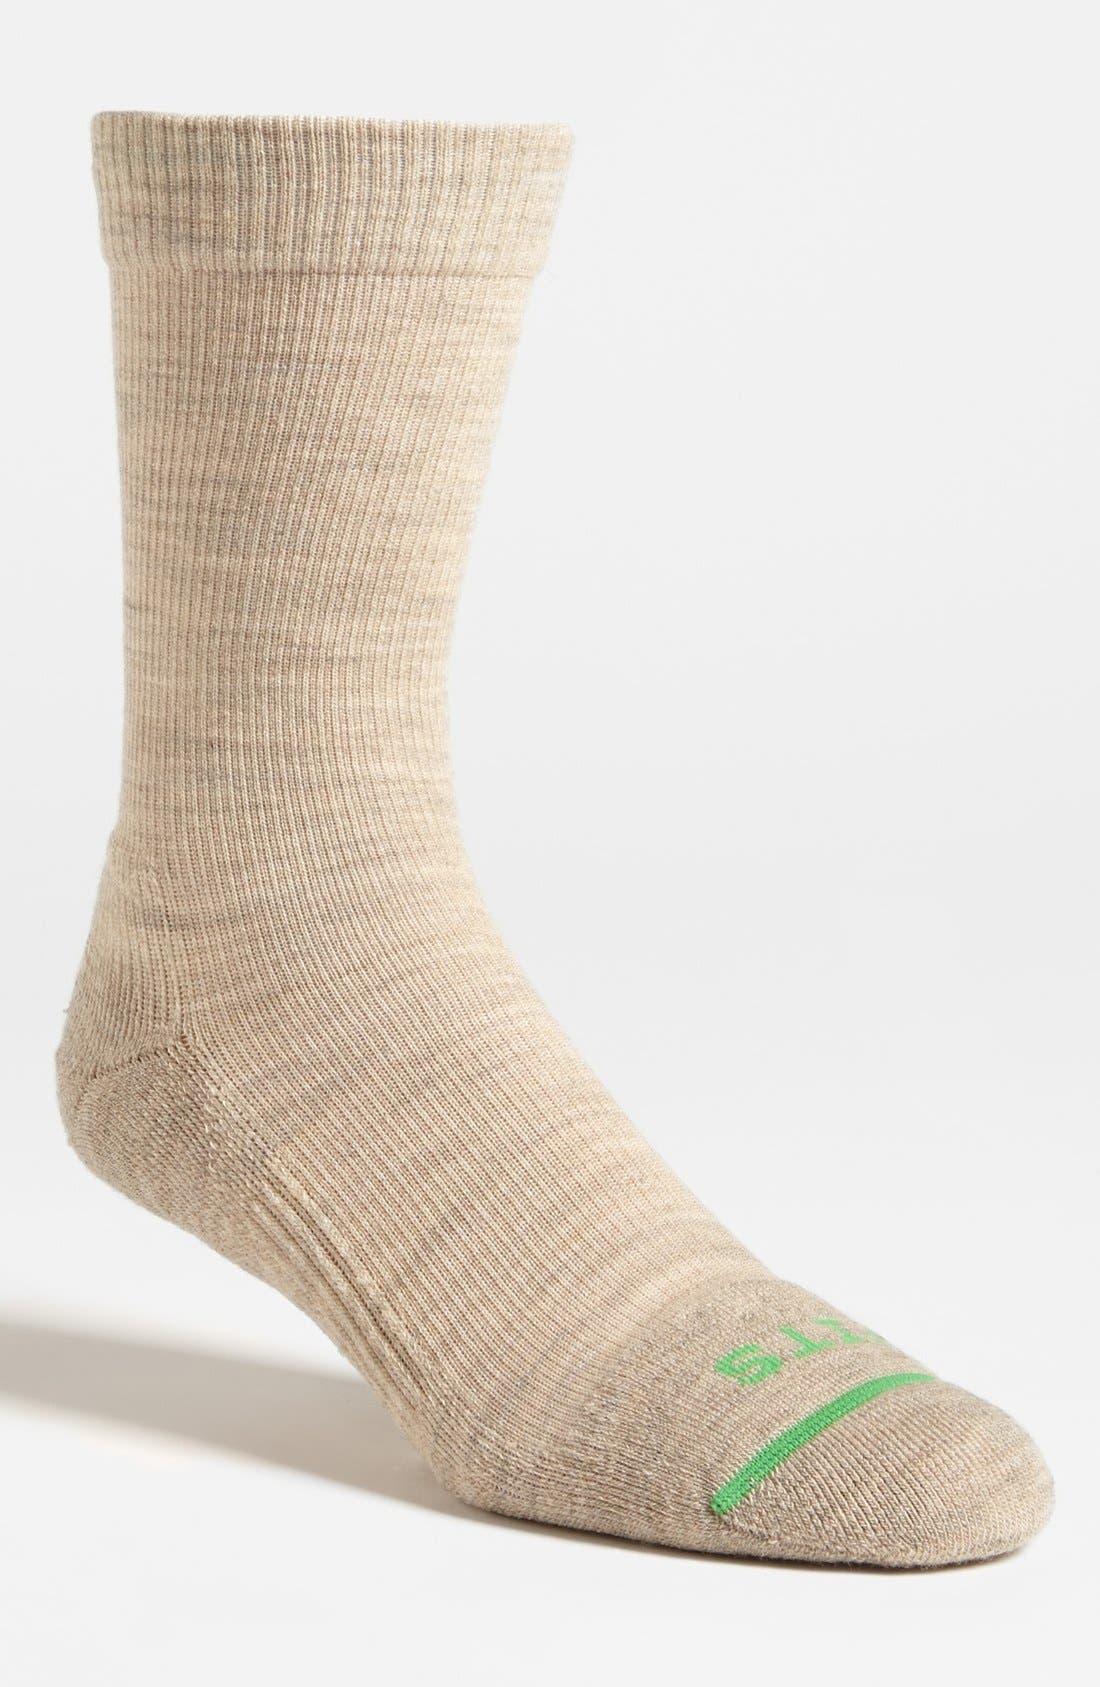 Co. Crew Socks,                         Main,                         color, Stone